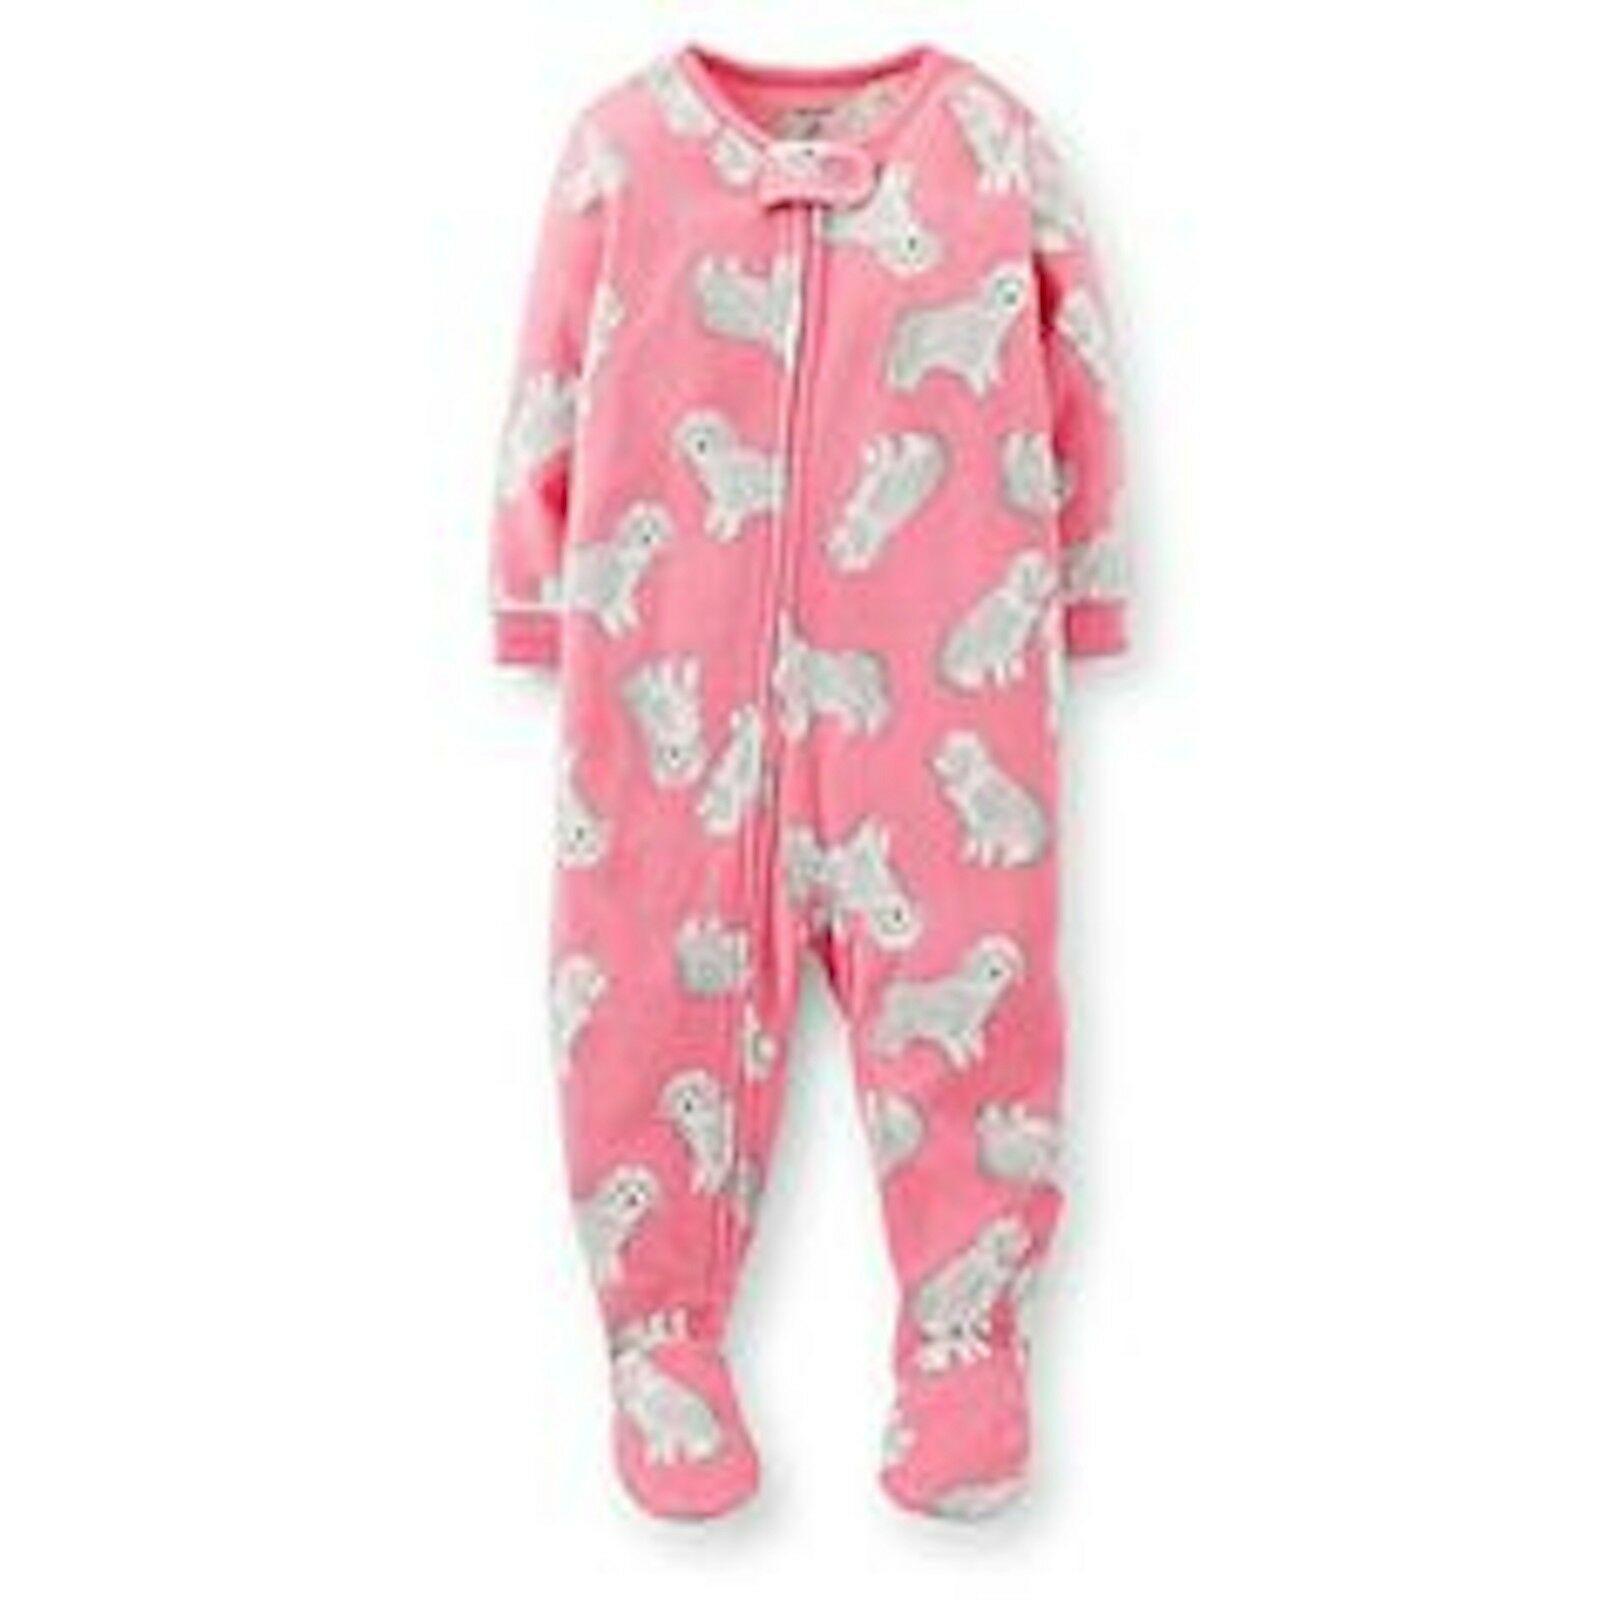 NWT BABY GIRL 1pc PAJAMA ~SLEEPER SIZE NEWBORN